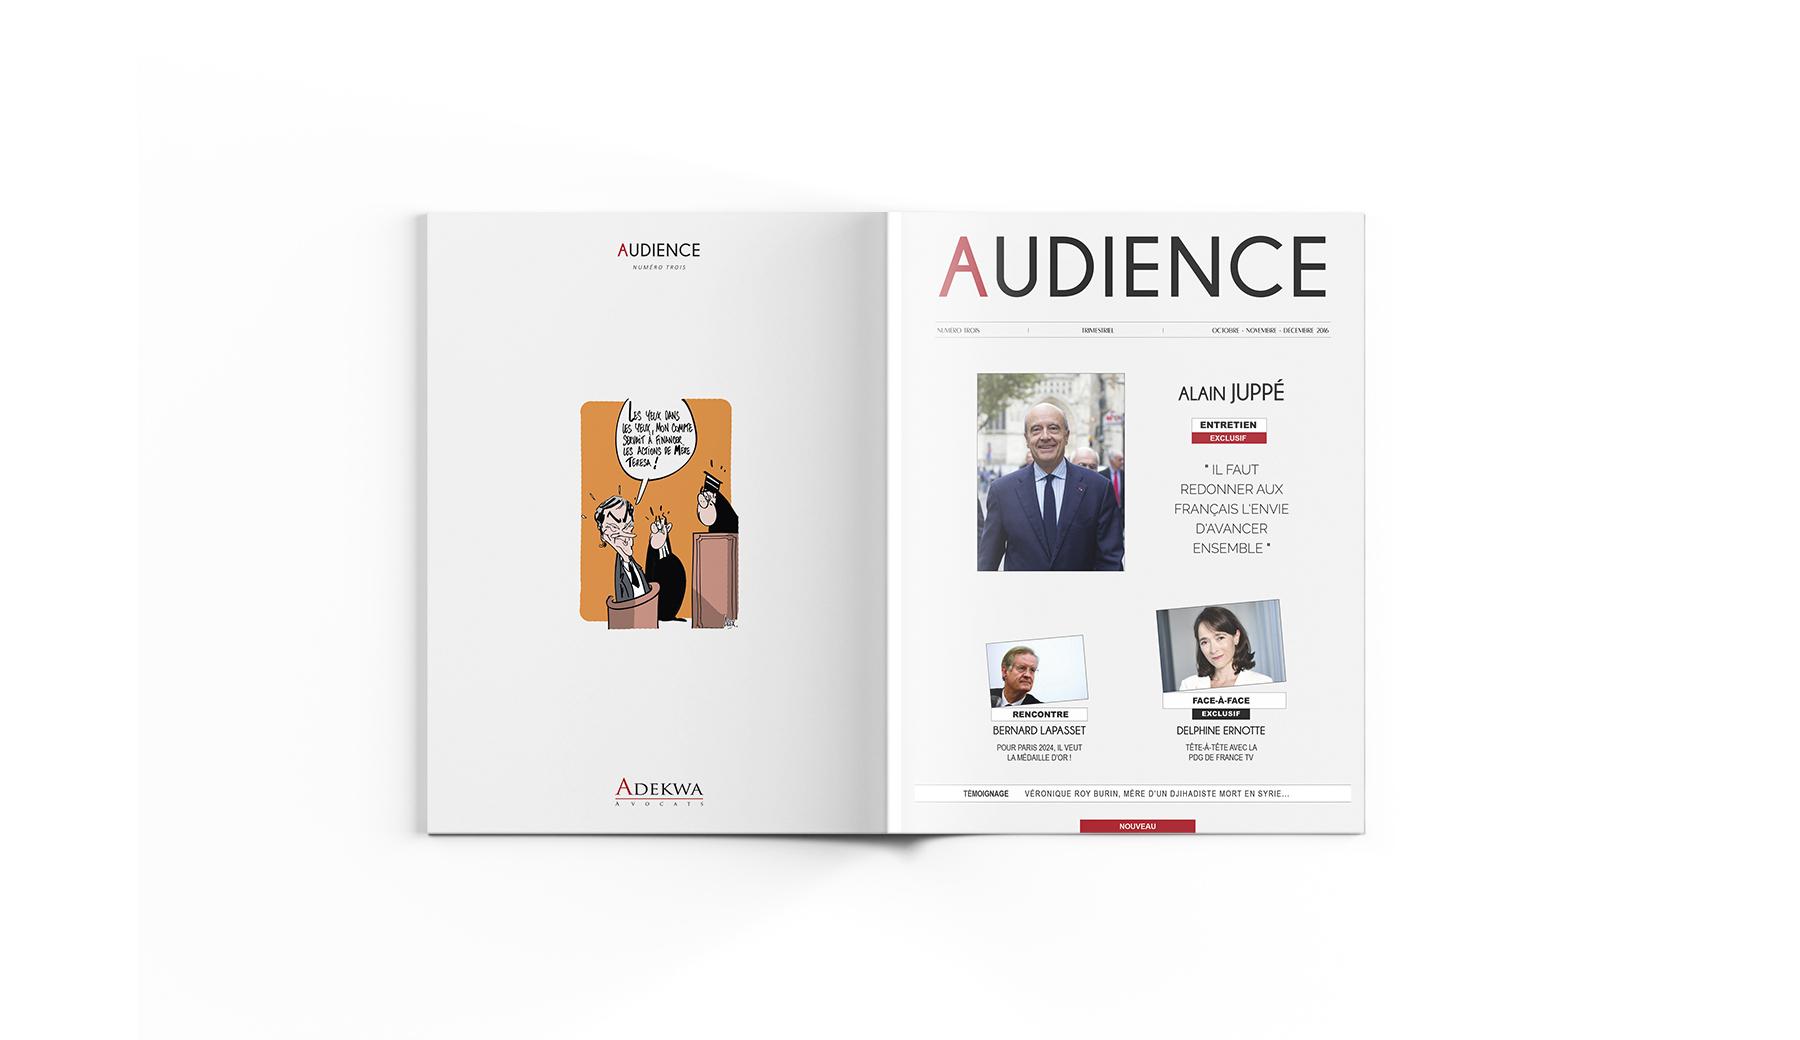 ADEKWA Avocats - AUDIENCE